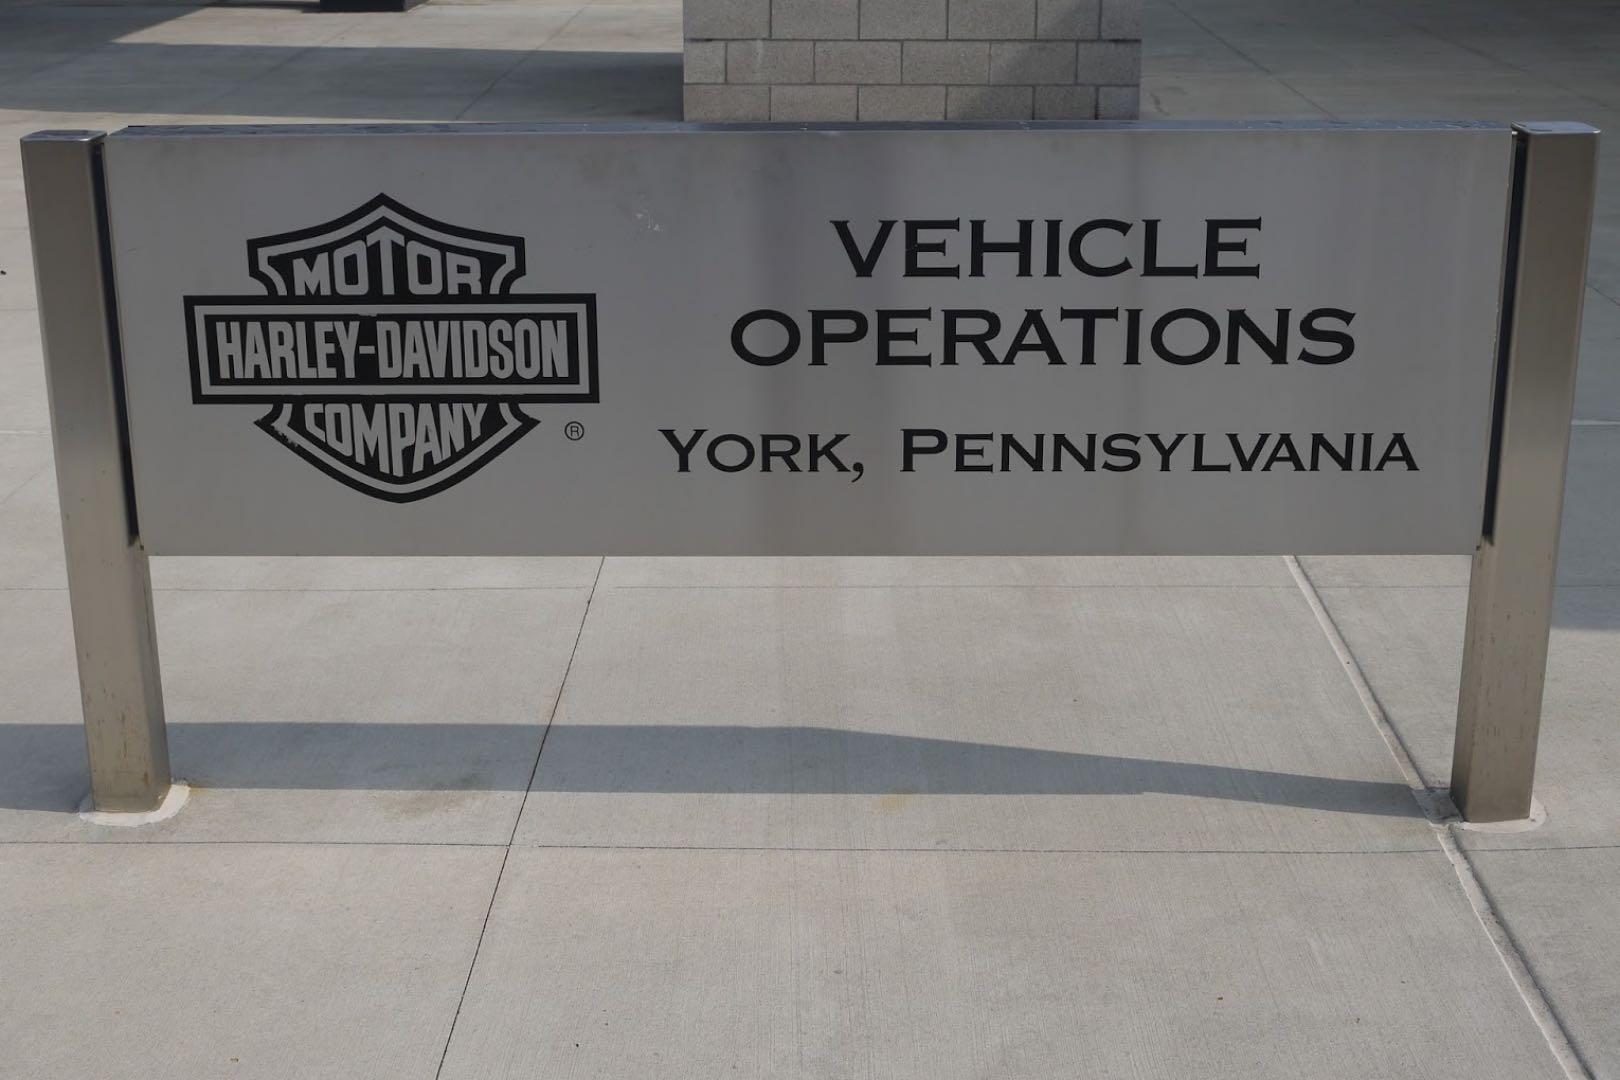 2017 harley-davidson layoff: 118 jobs cut in york pa plant